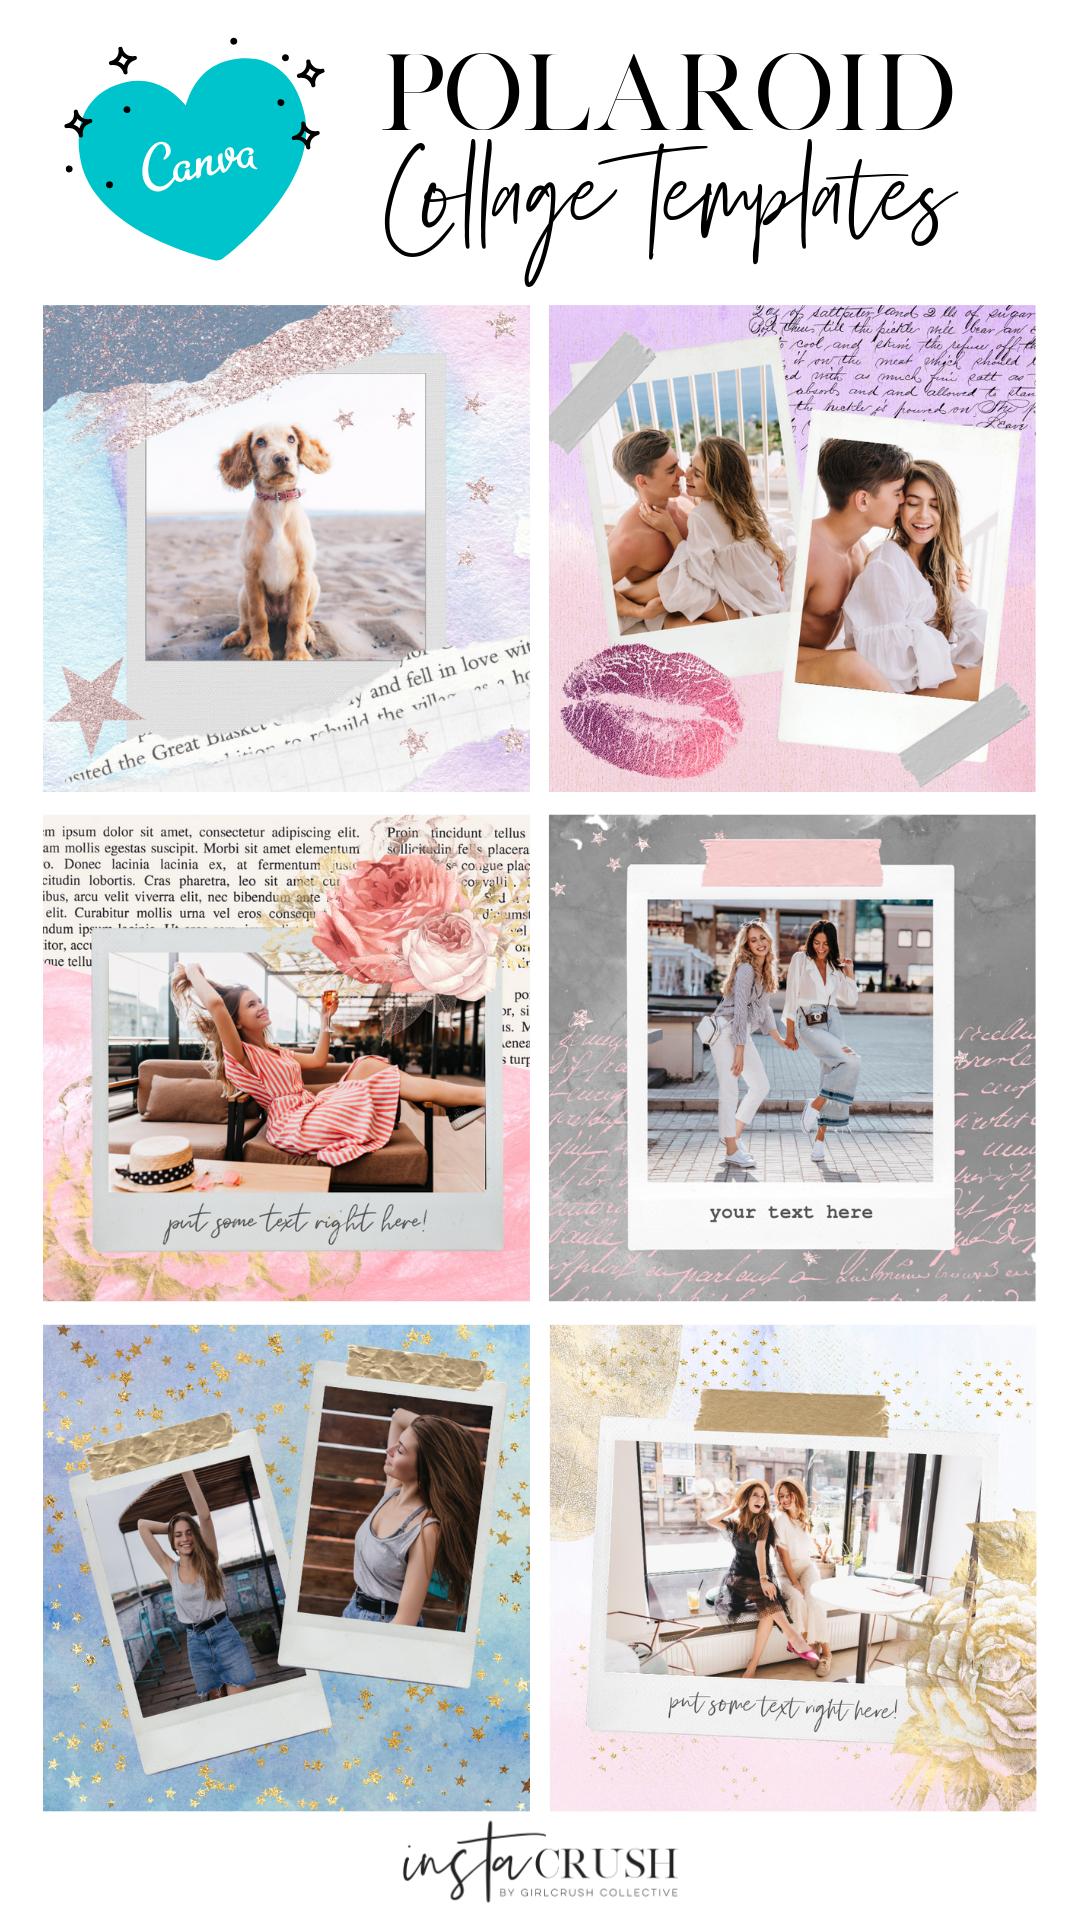 Polaroid Collage Templates Canva Collage Template Polaroid Collage Templates